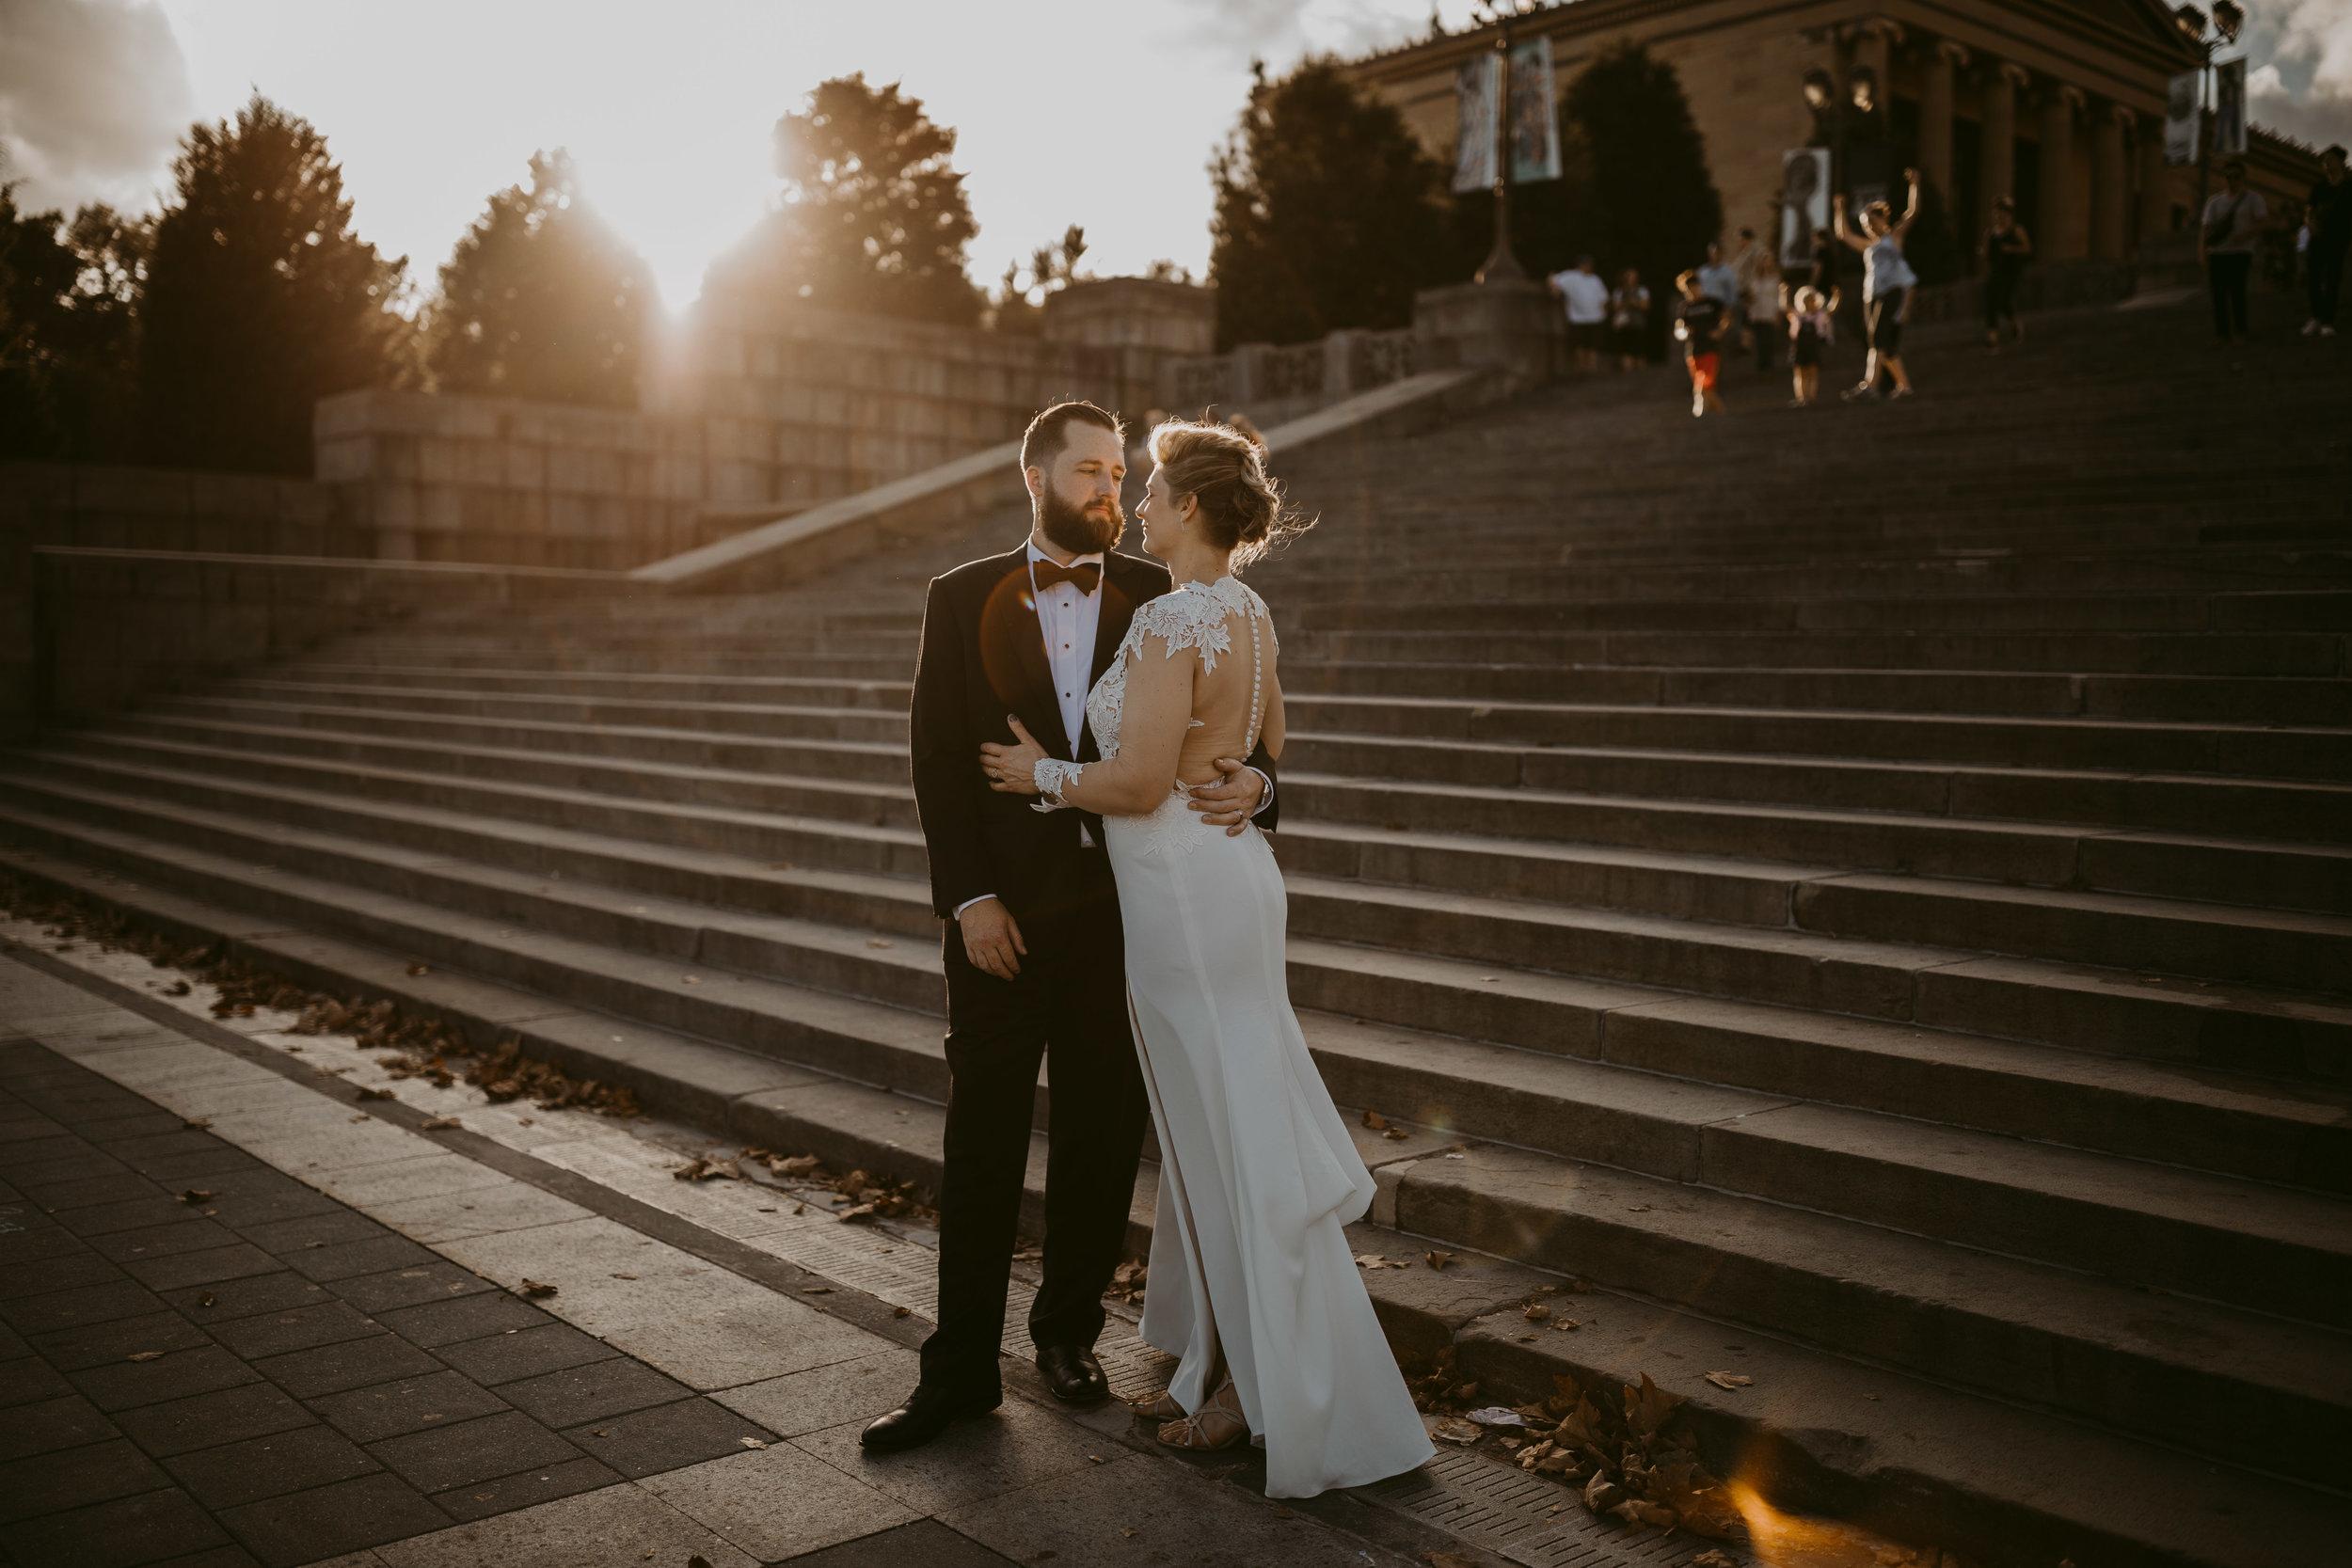 JessicaandRussell-OctoberWedding2017-3(154of162).jpg